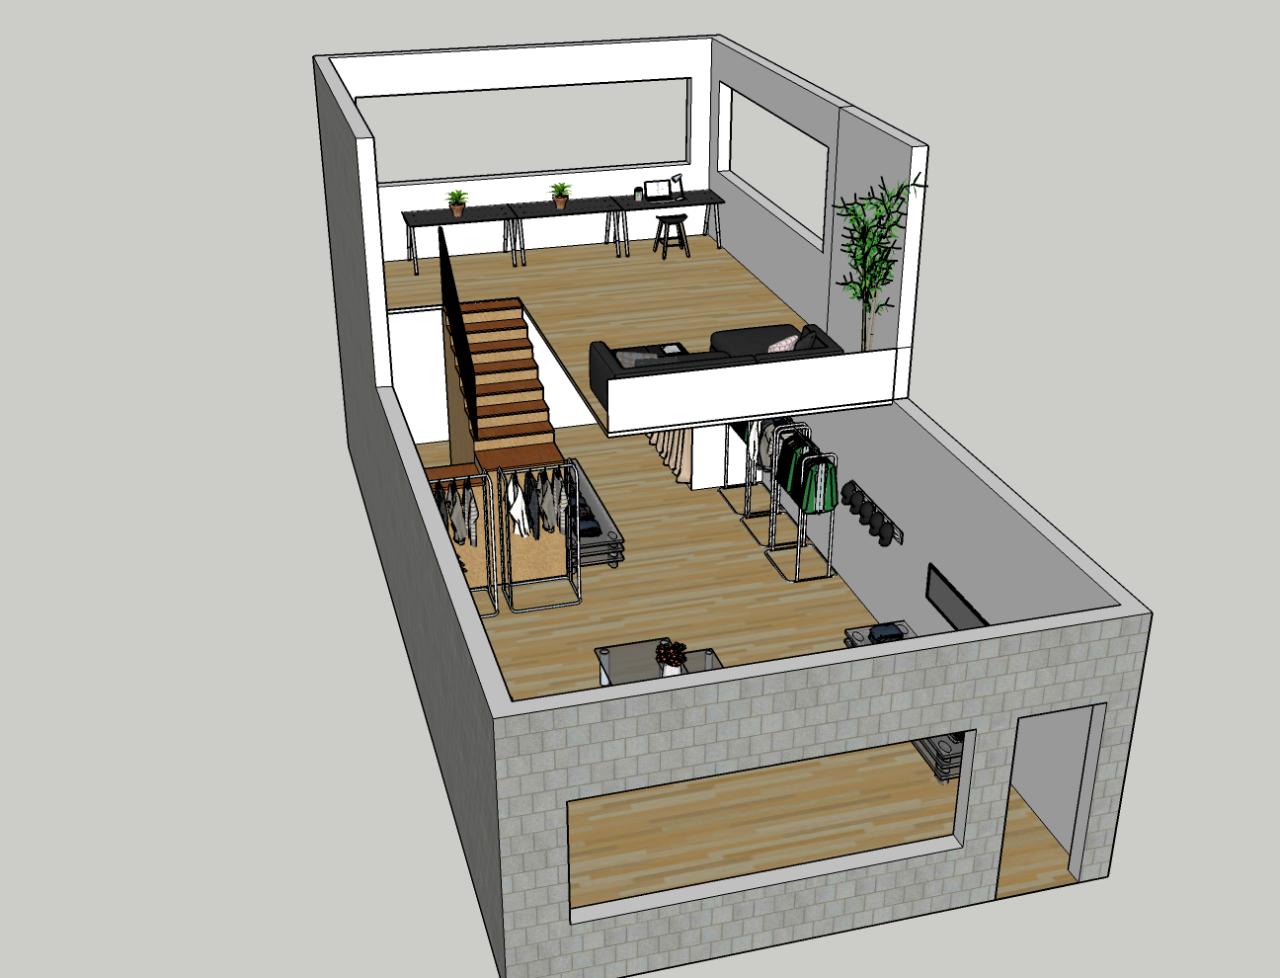 After-School: Digital Design: Pop-Up Architecture (Grades 6-8) – Online